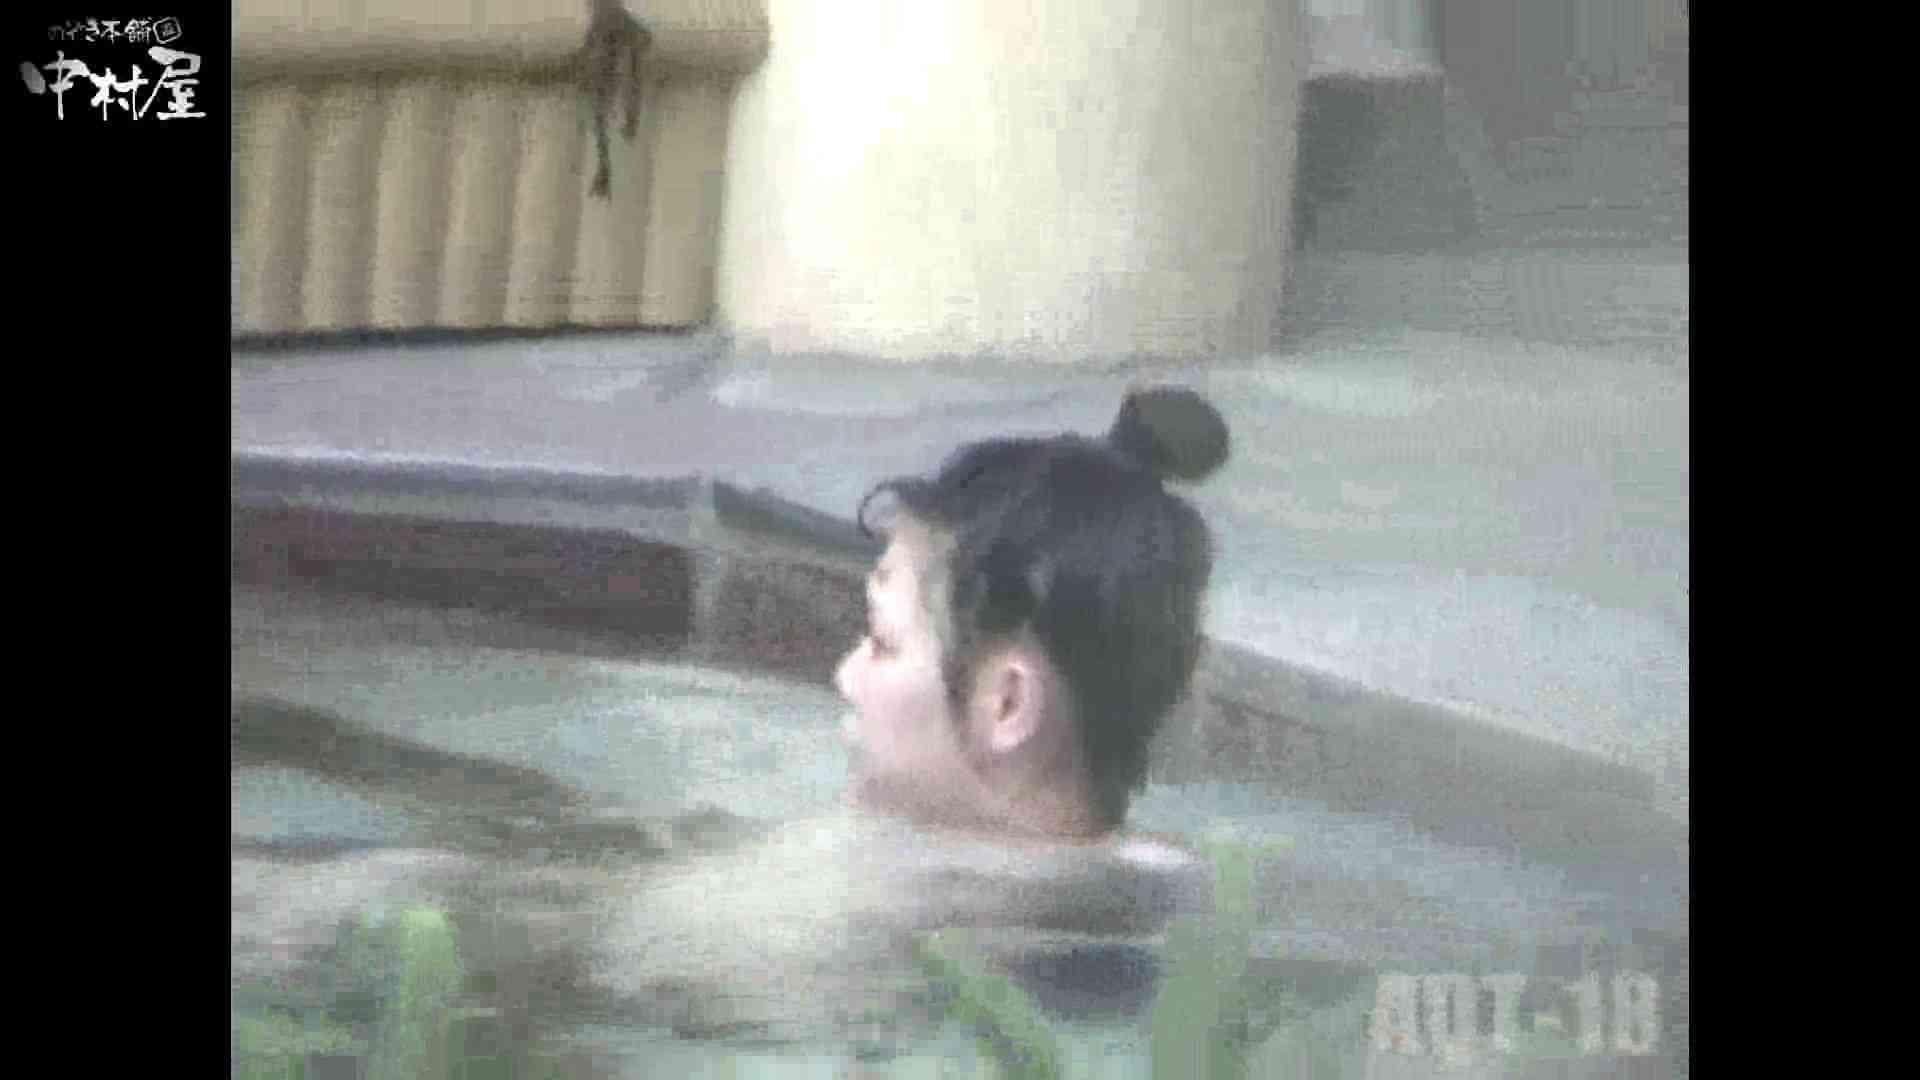 Aquaな露天風呂Vol.882潜入盗撮露天風呂十八判湯 其の二 露天  78PICs 24